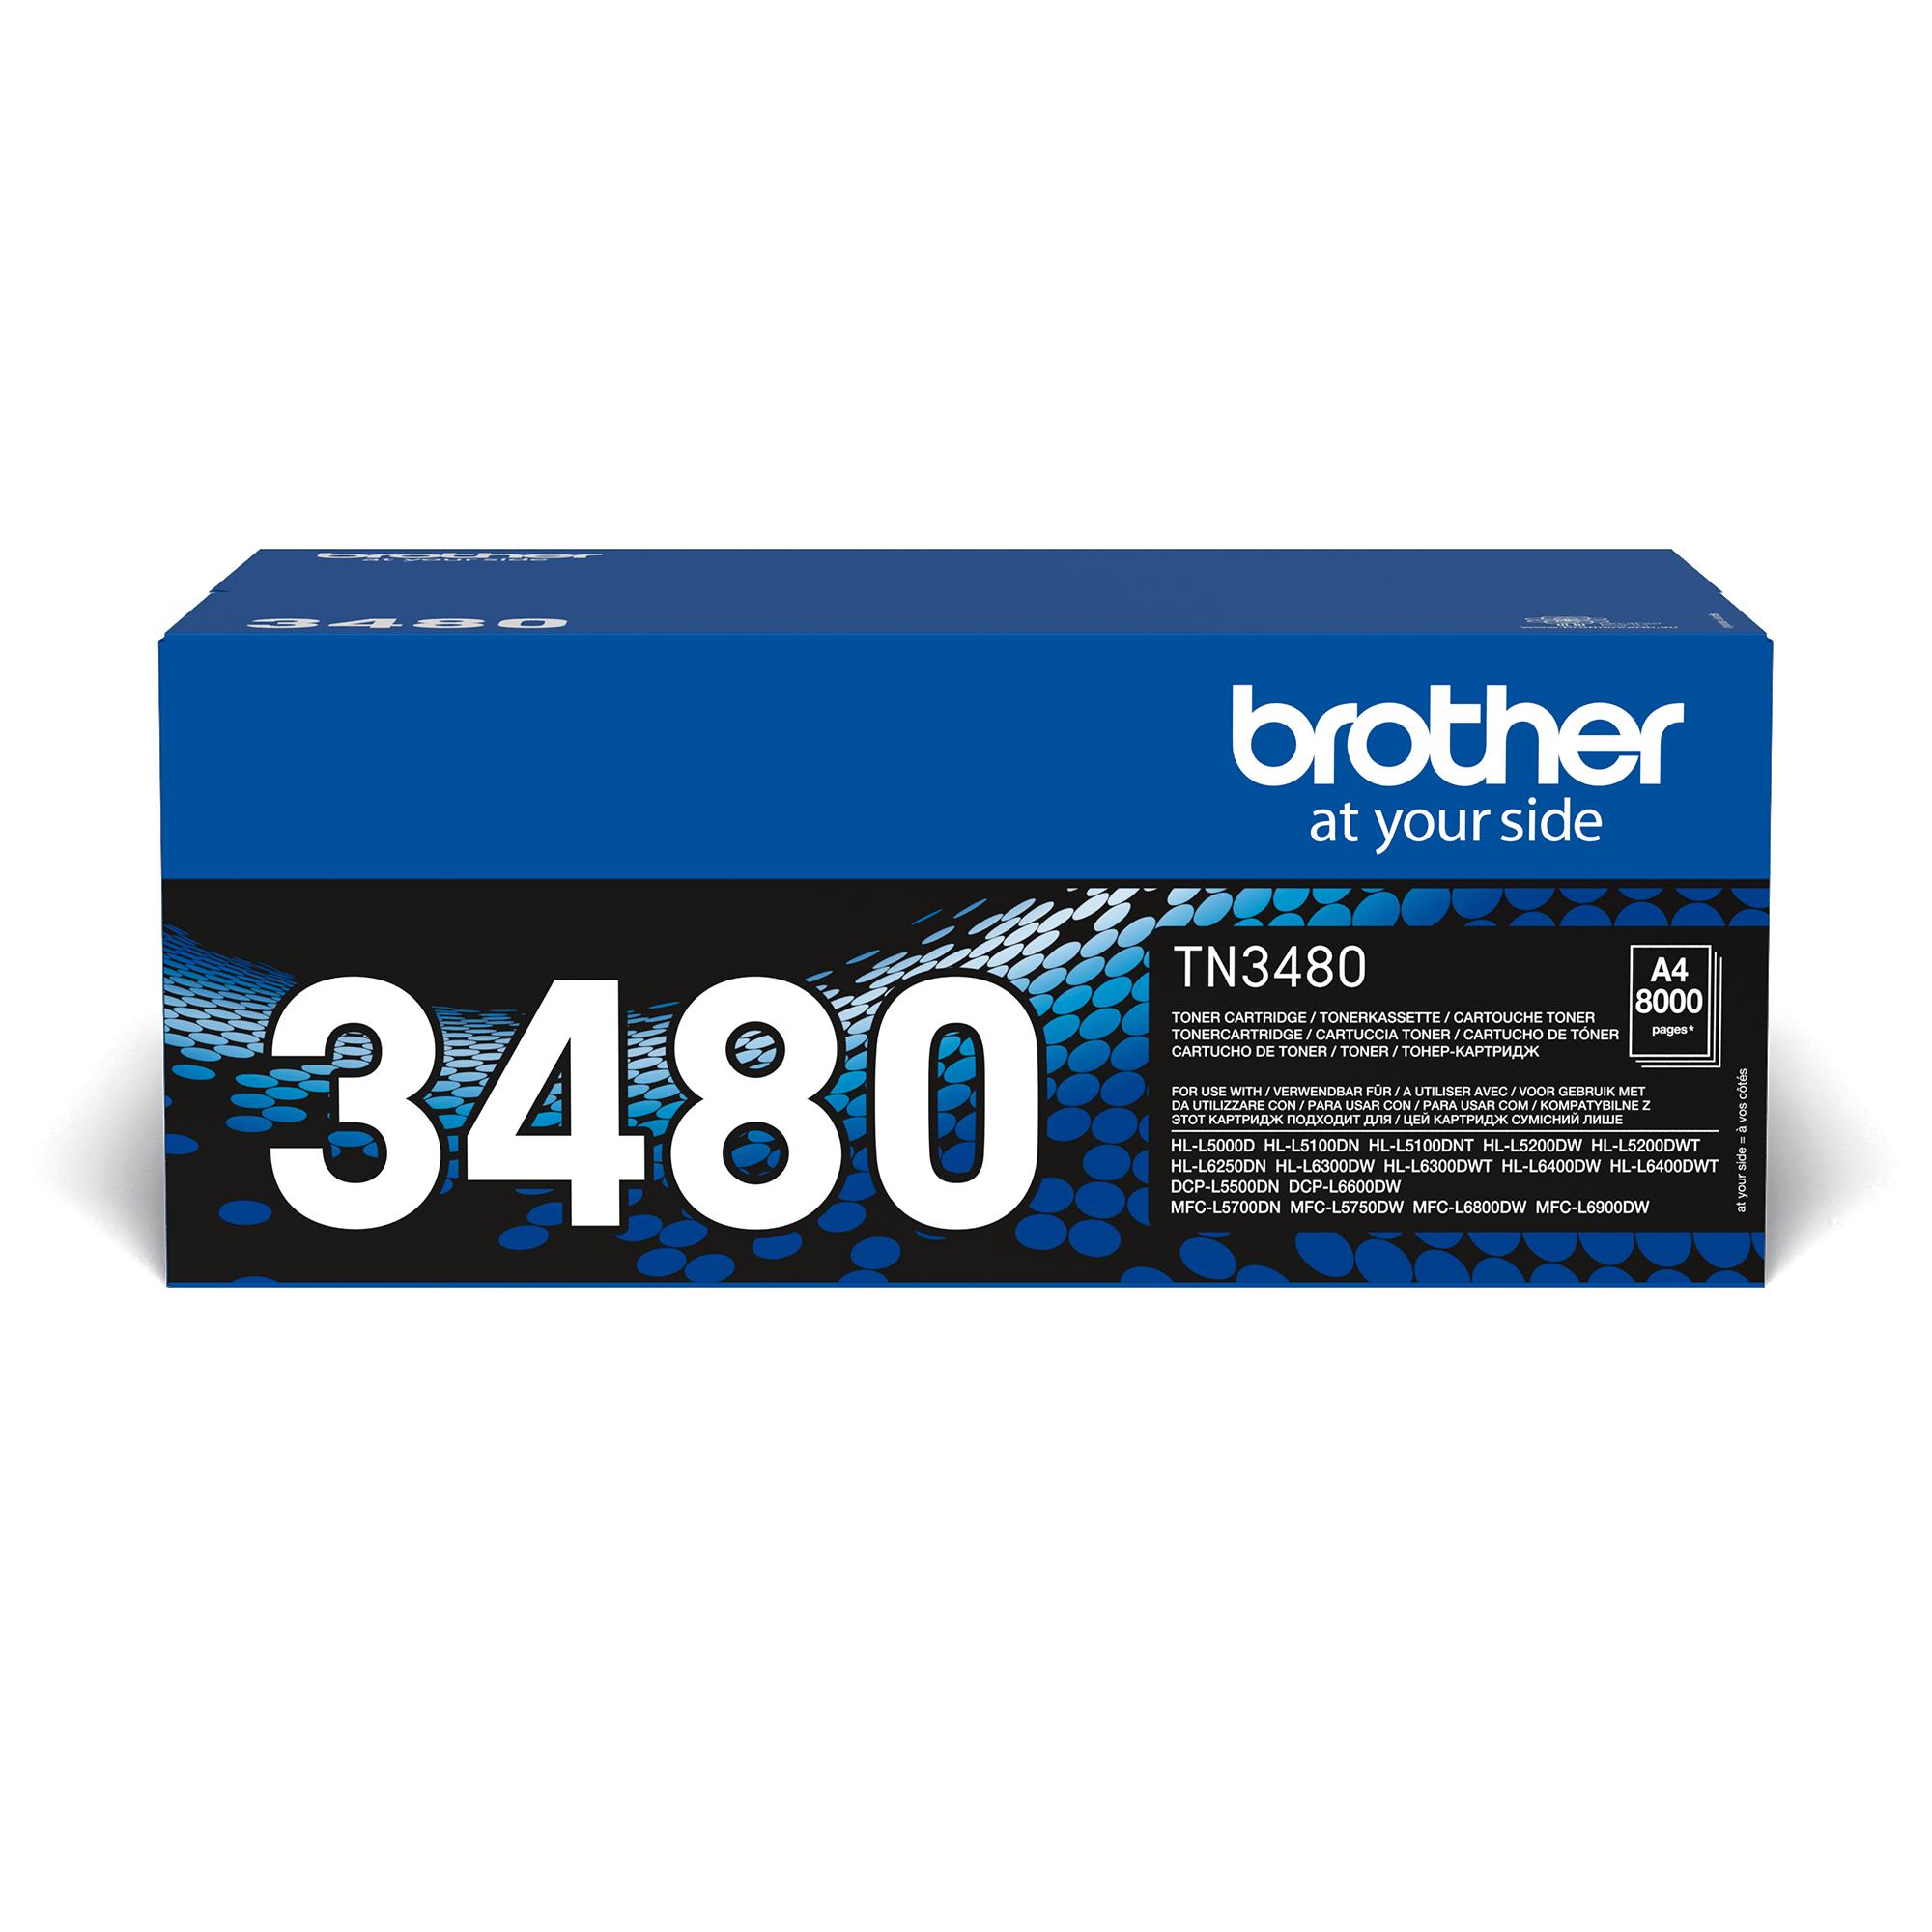 TN3480_main